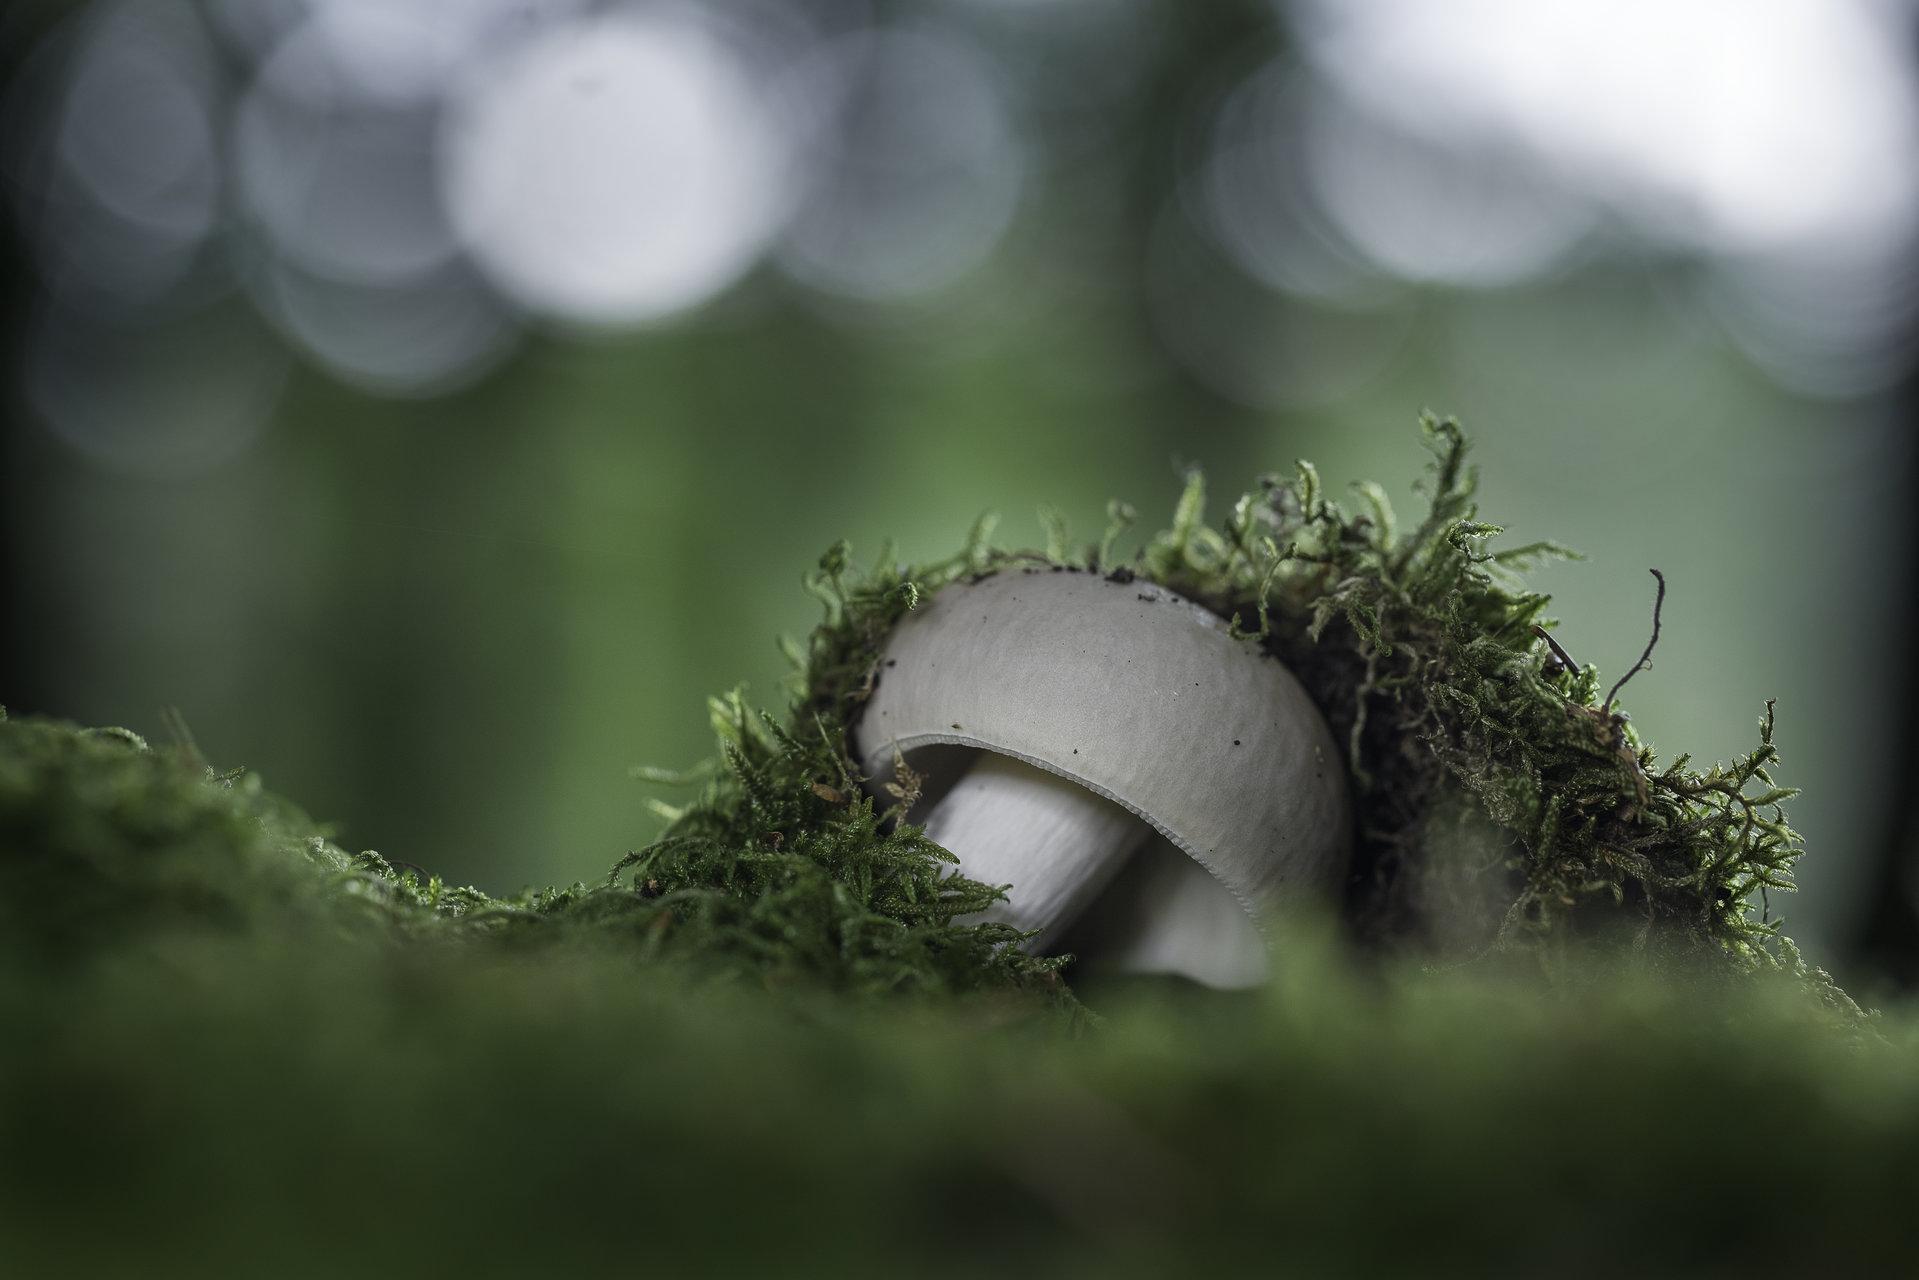 Photo in Macro | Author Valentin Ivanov - valniuk | PHOTO FORUM